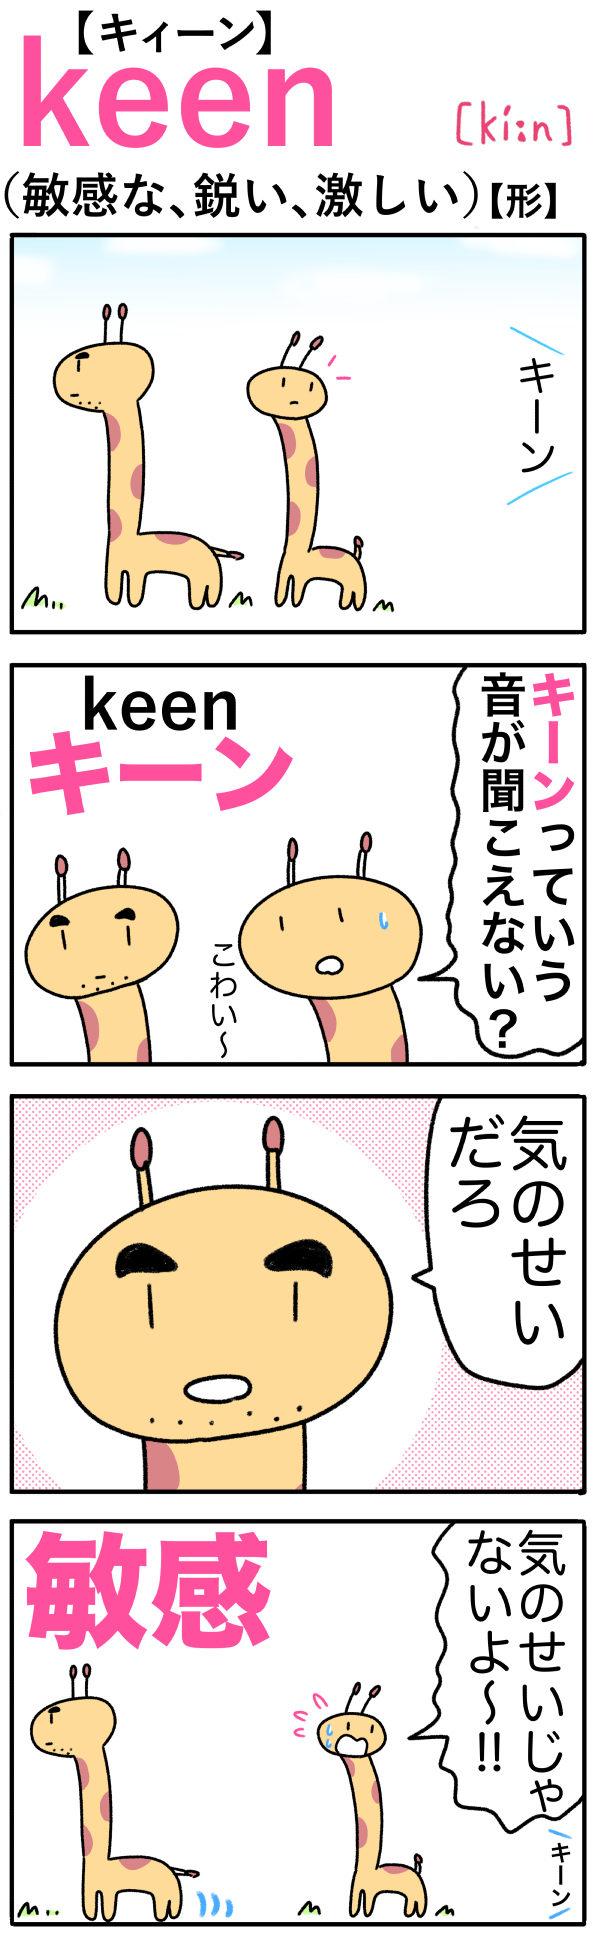 keen(敏感な、鋭い)の語呂合わせ英単語